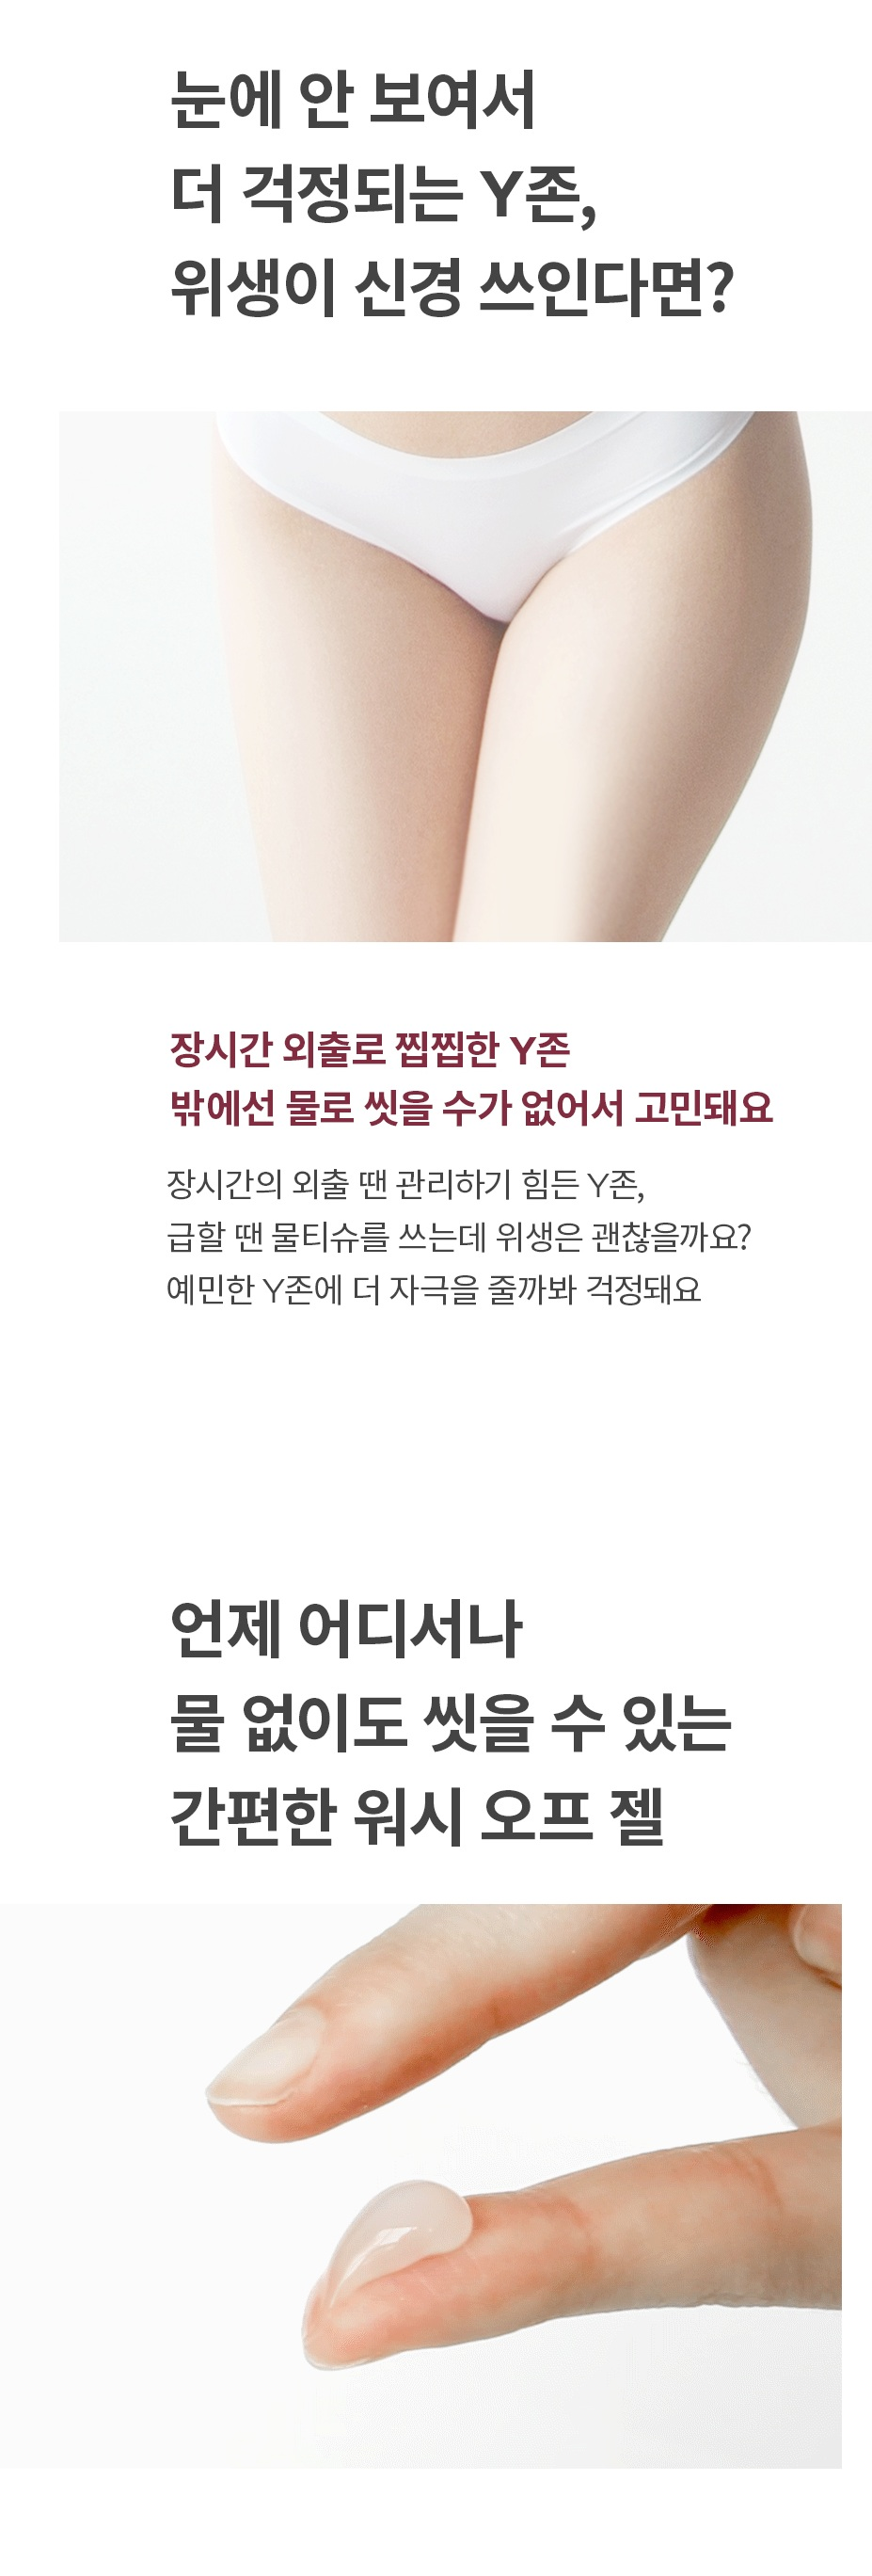 Manyo Factory Feminine Wash Off Gel 80ml korean skincare product online shop malaysia Macau2